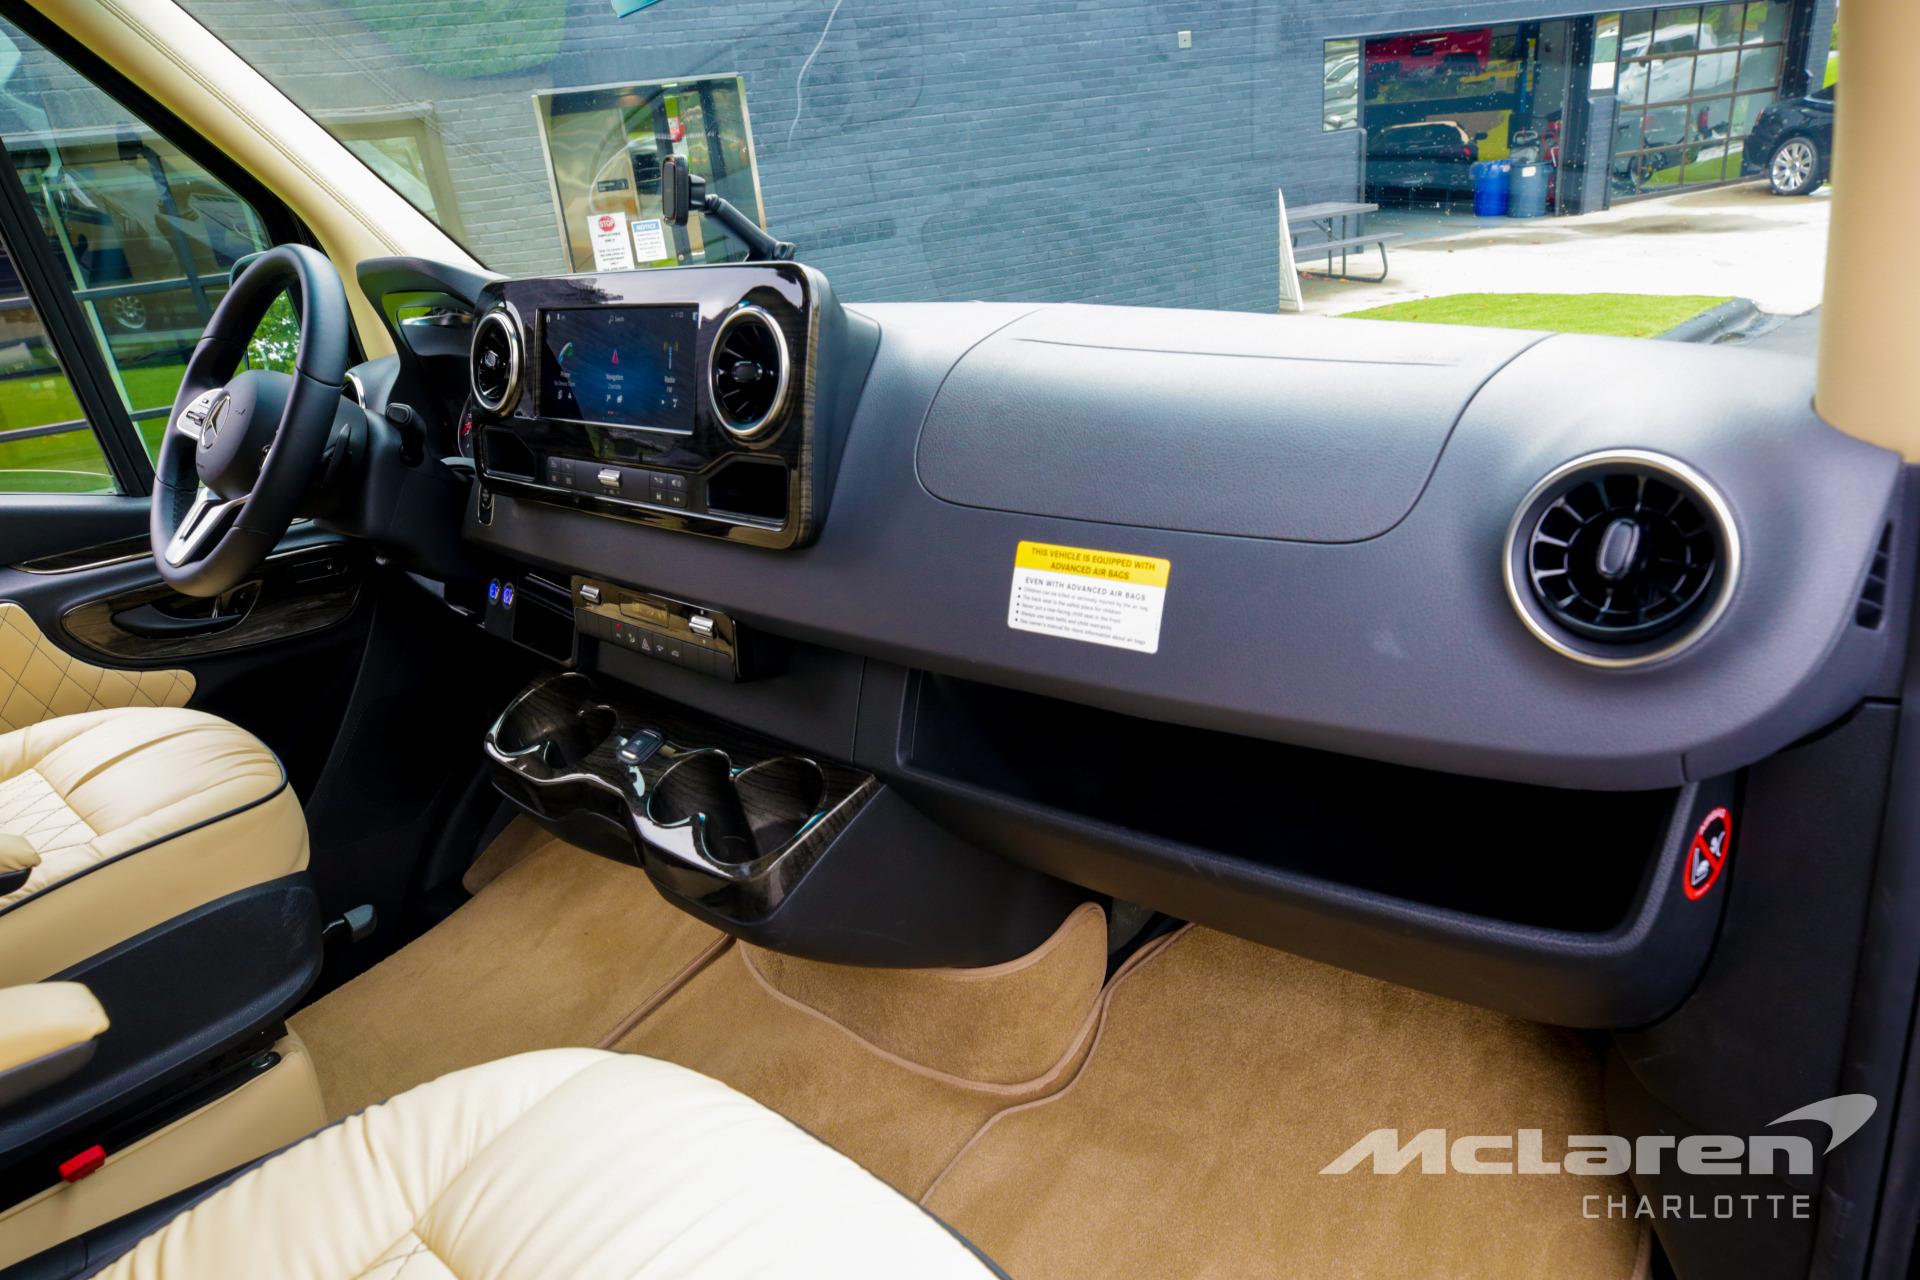 Used 2020 Mercedes-Benz Sprinter Cargo 3500 | Charlotte, NC